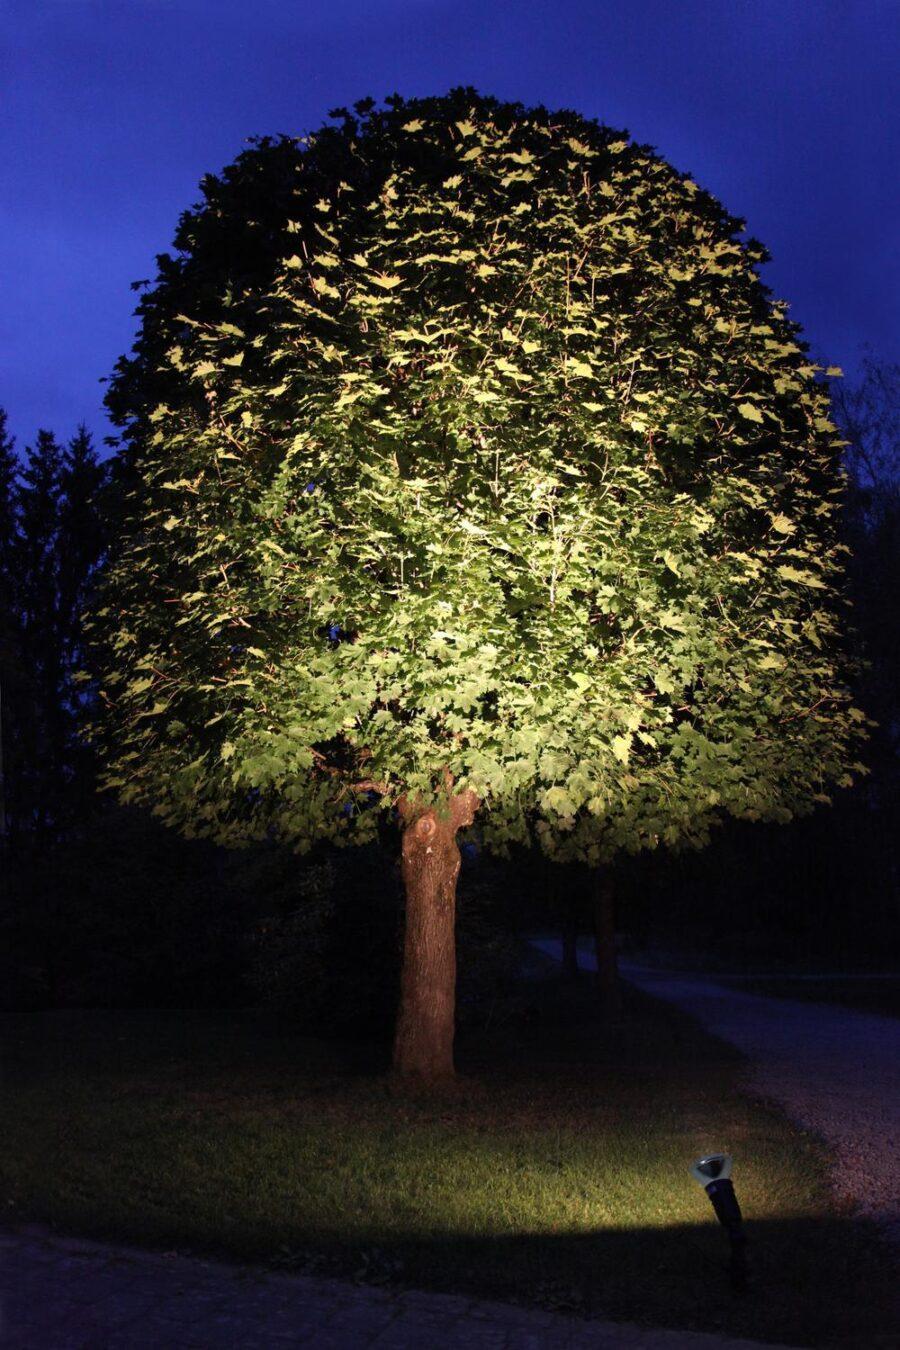 LED-lampa E27 Spotlight Outdoor 15W. Varmvit 1100Lm